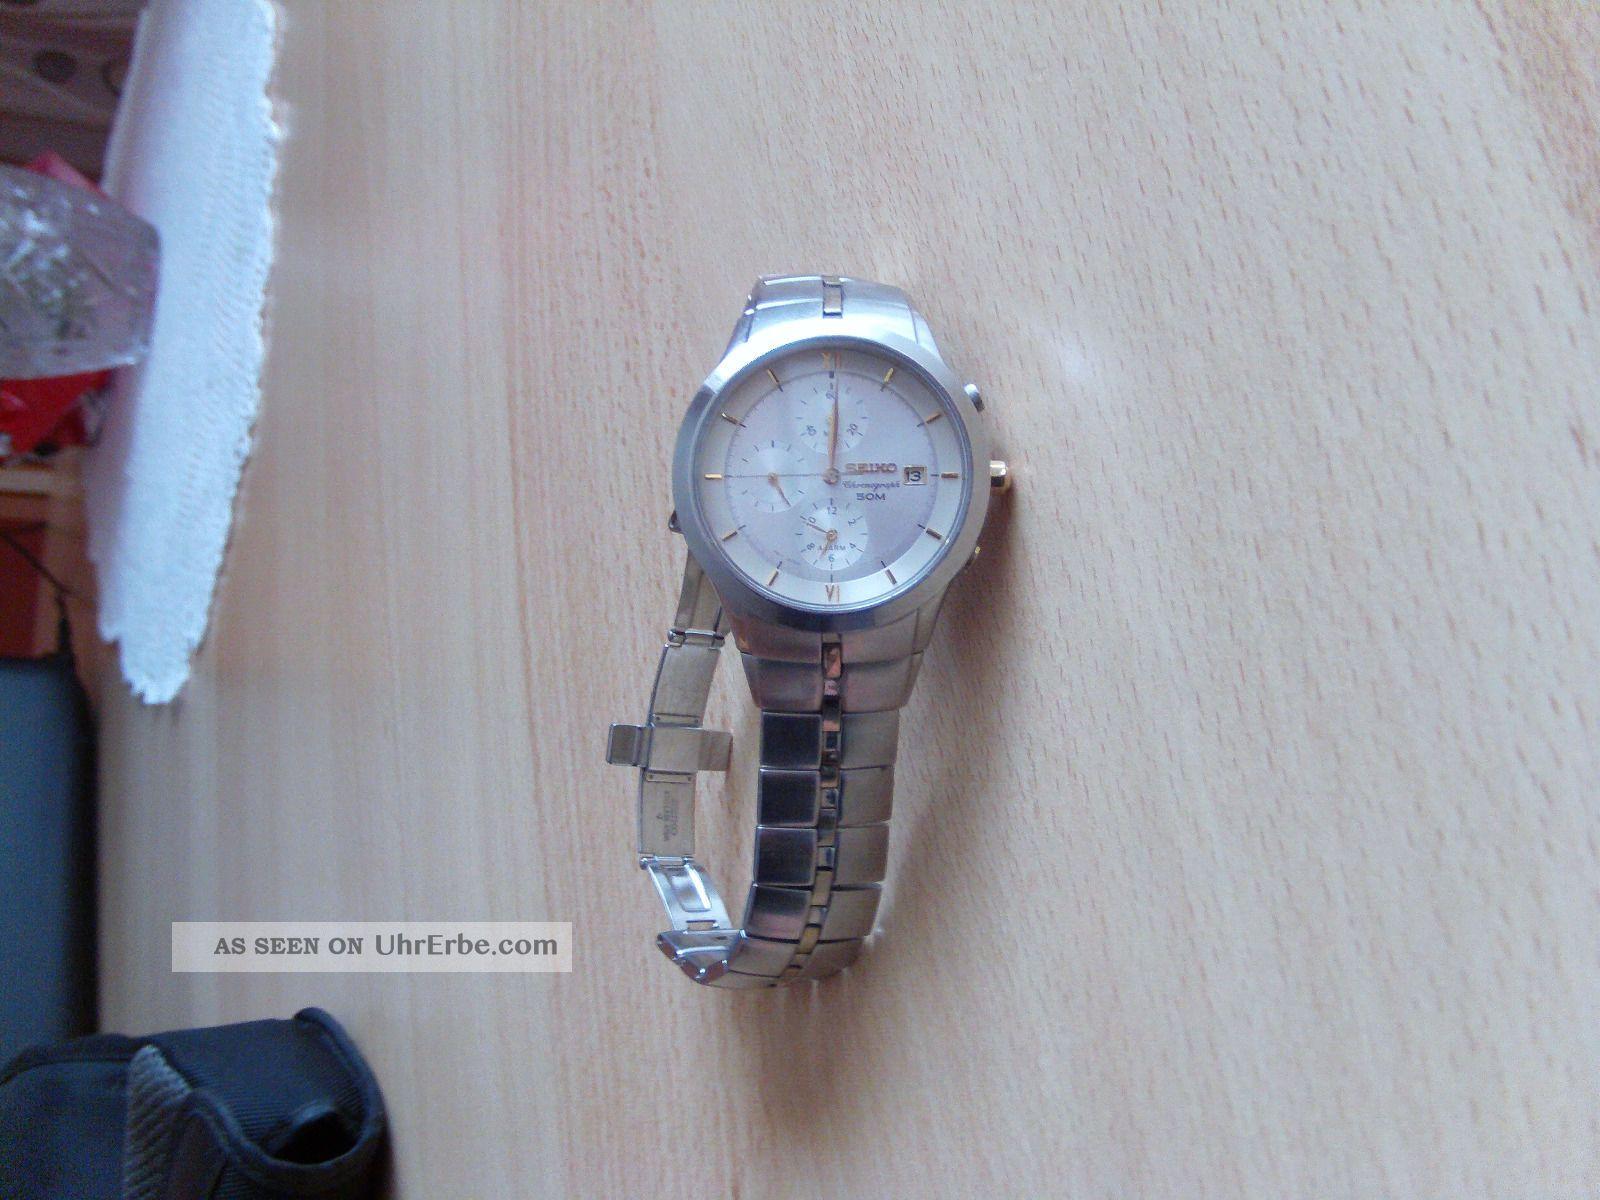 Seiko Uhr Armbanduhren Bild